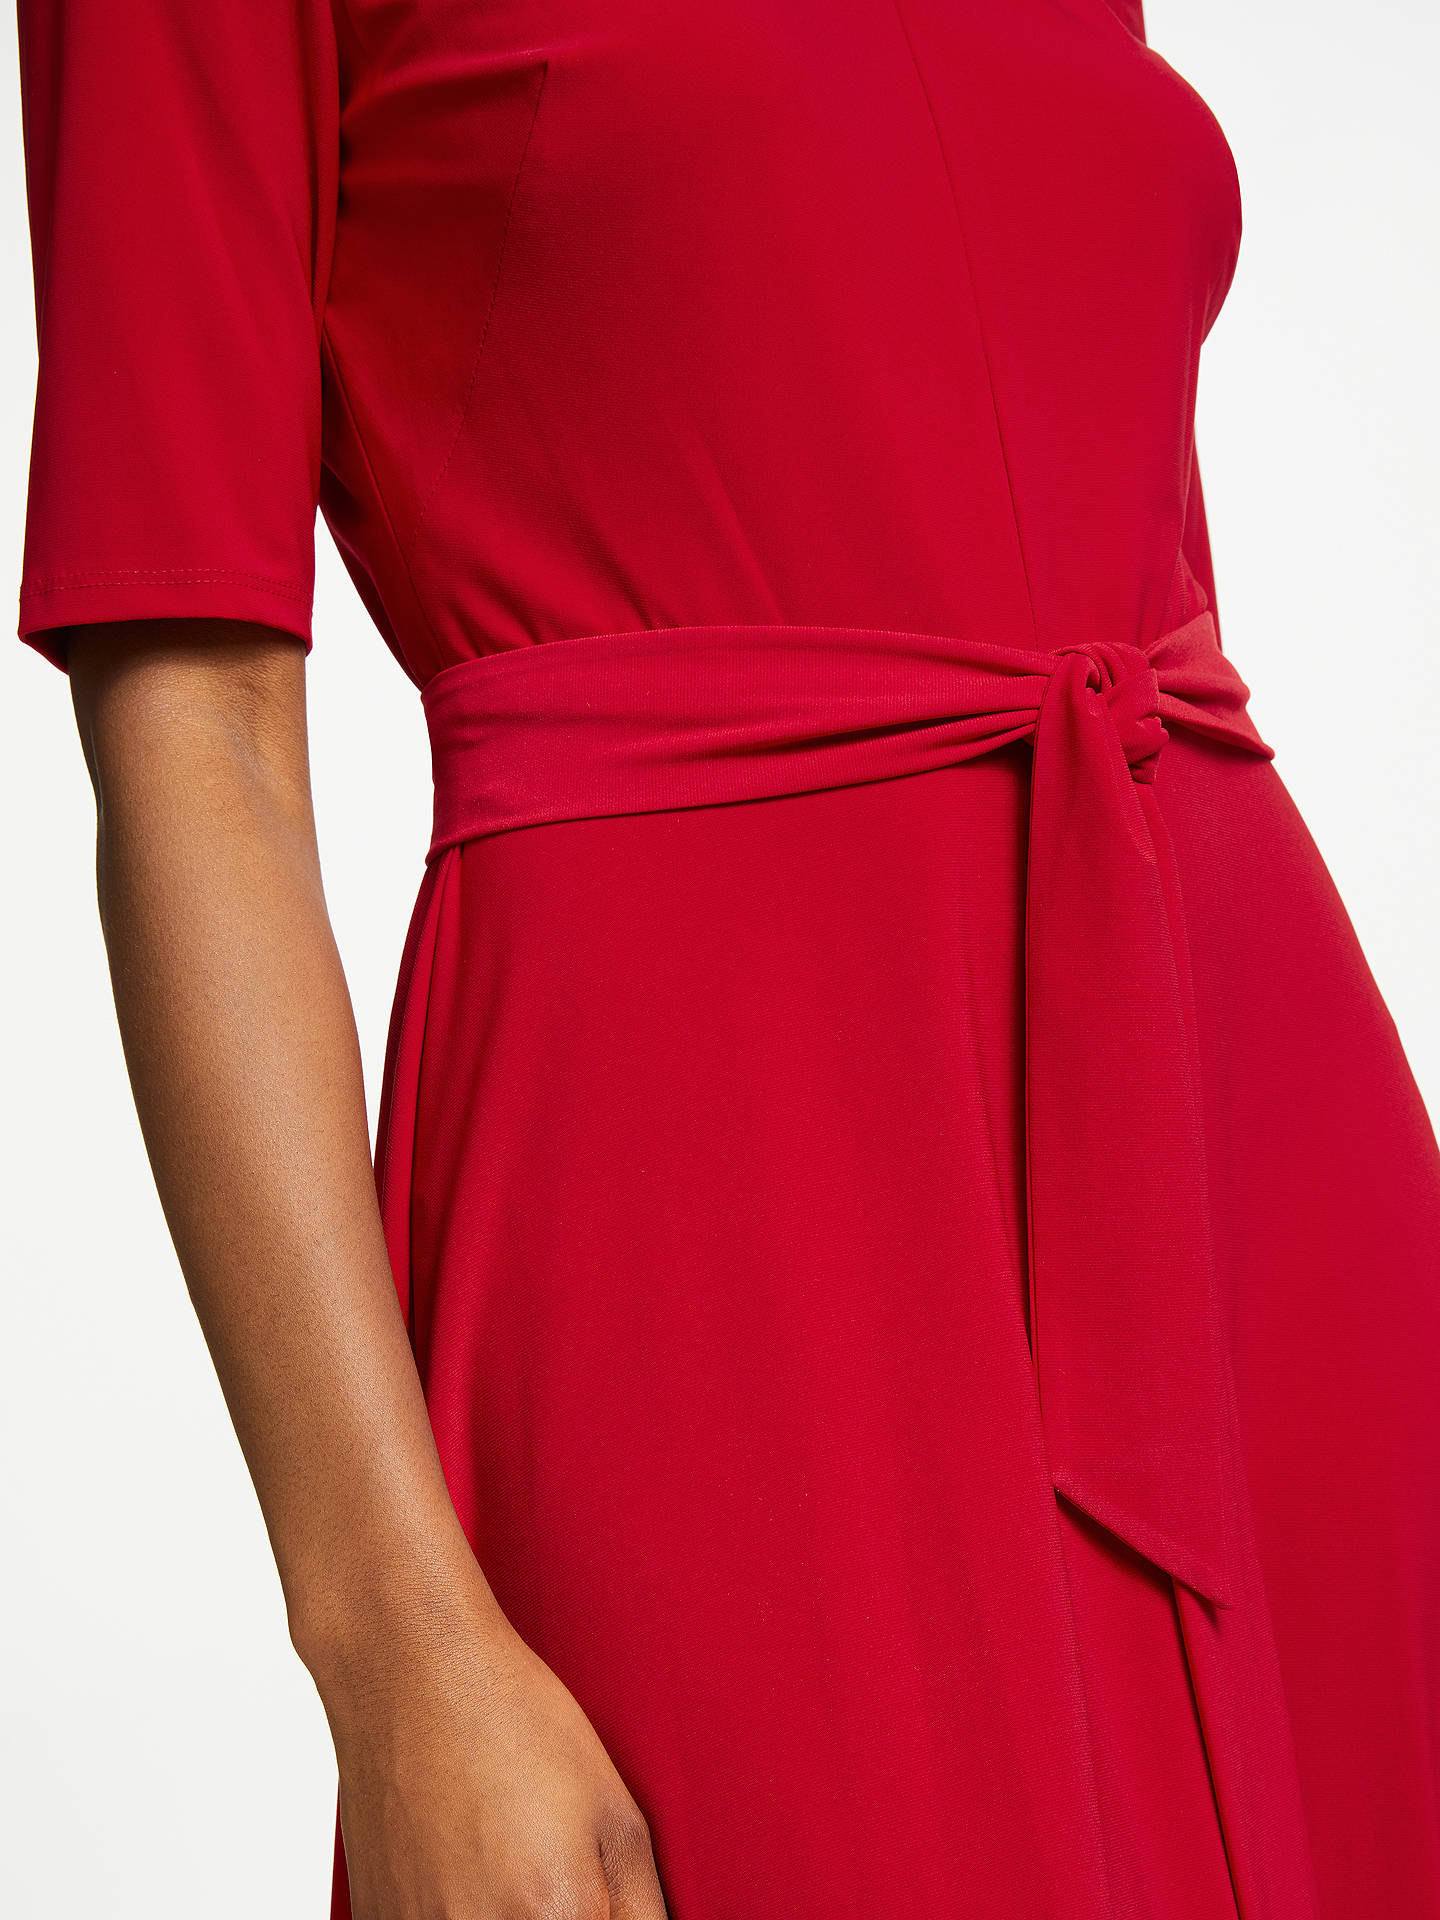 62509a0583f ... Buy Lauren Ralph Lauren Chicky Dress